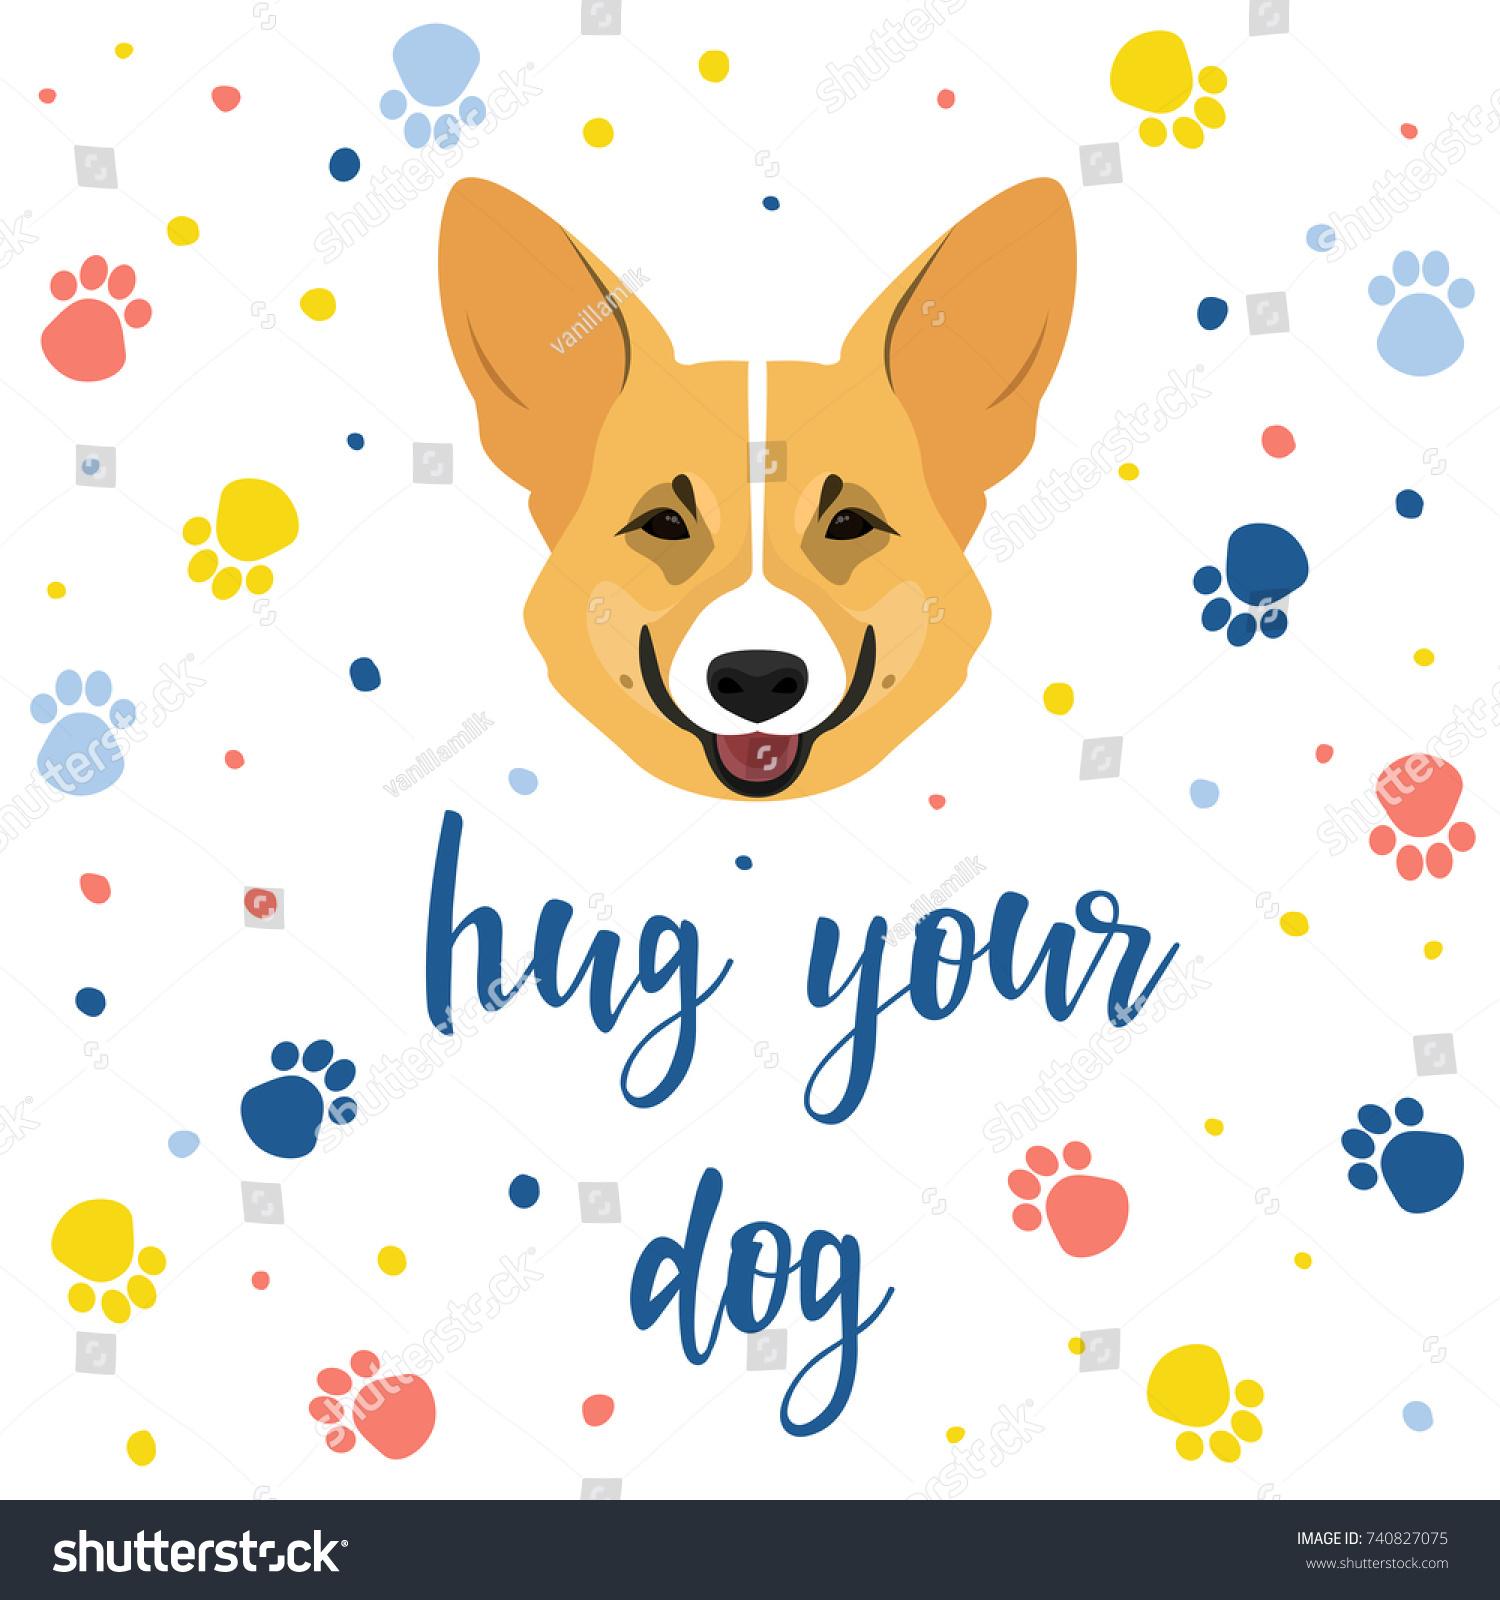 New Year Dog Card Template Cute Stock Vector 740827075 - Shutterstock